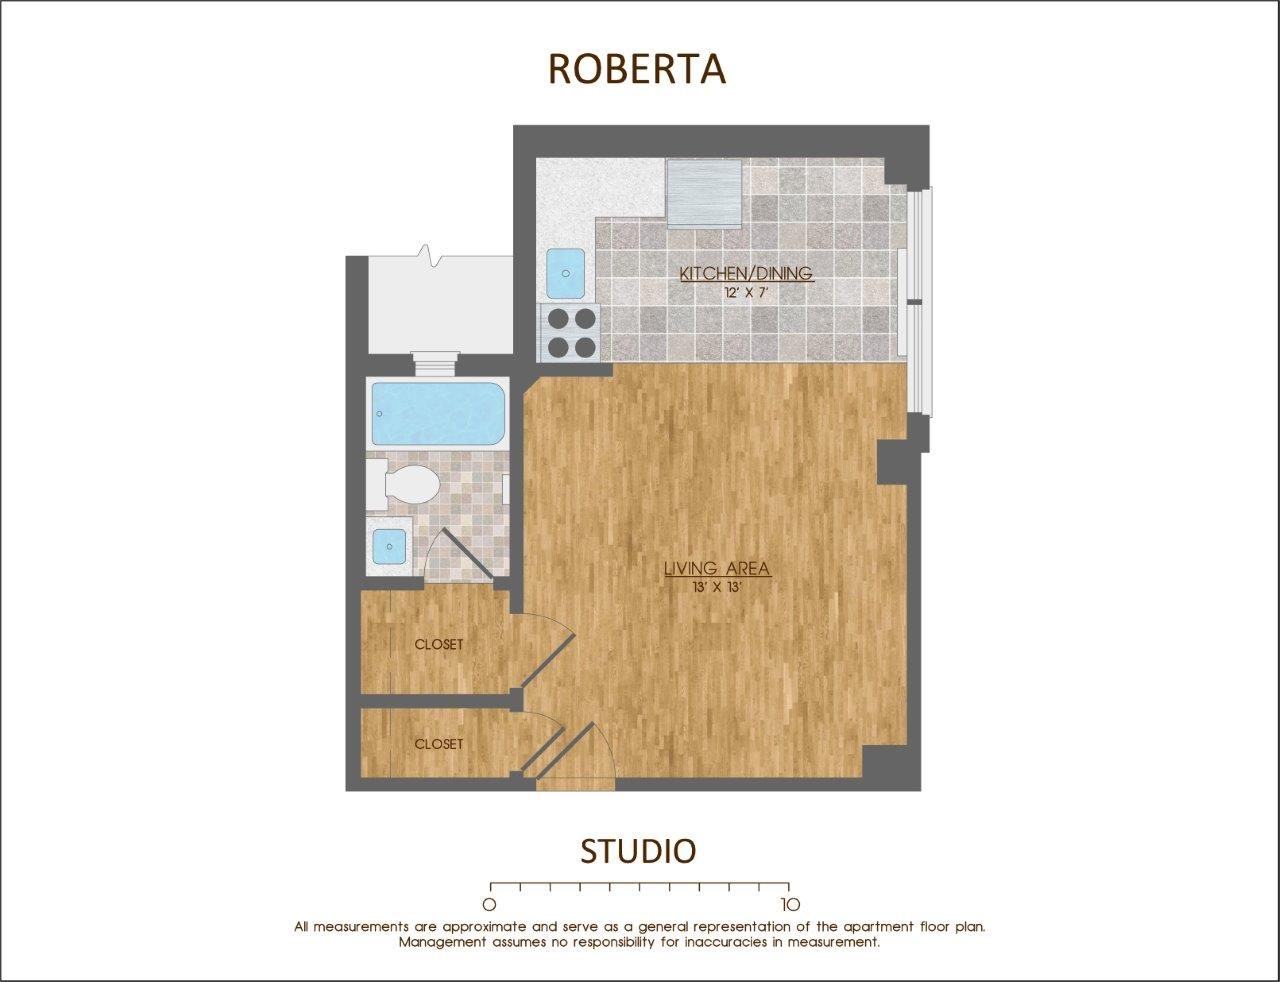 The Roberta